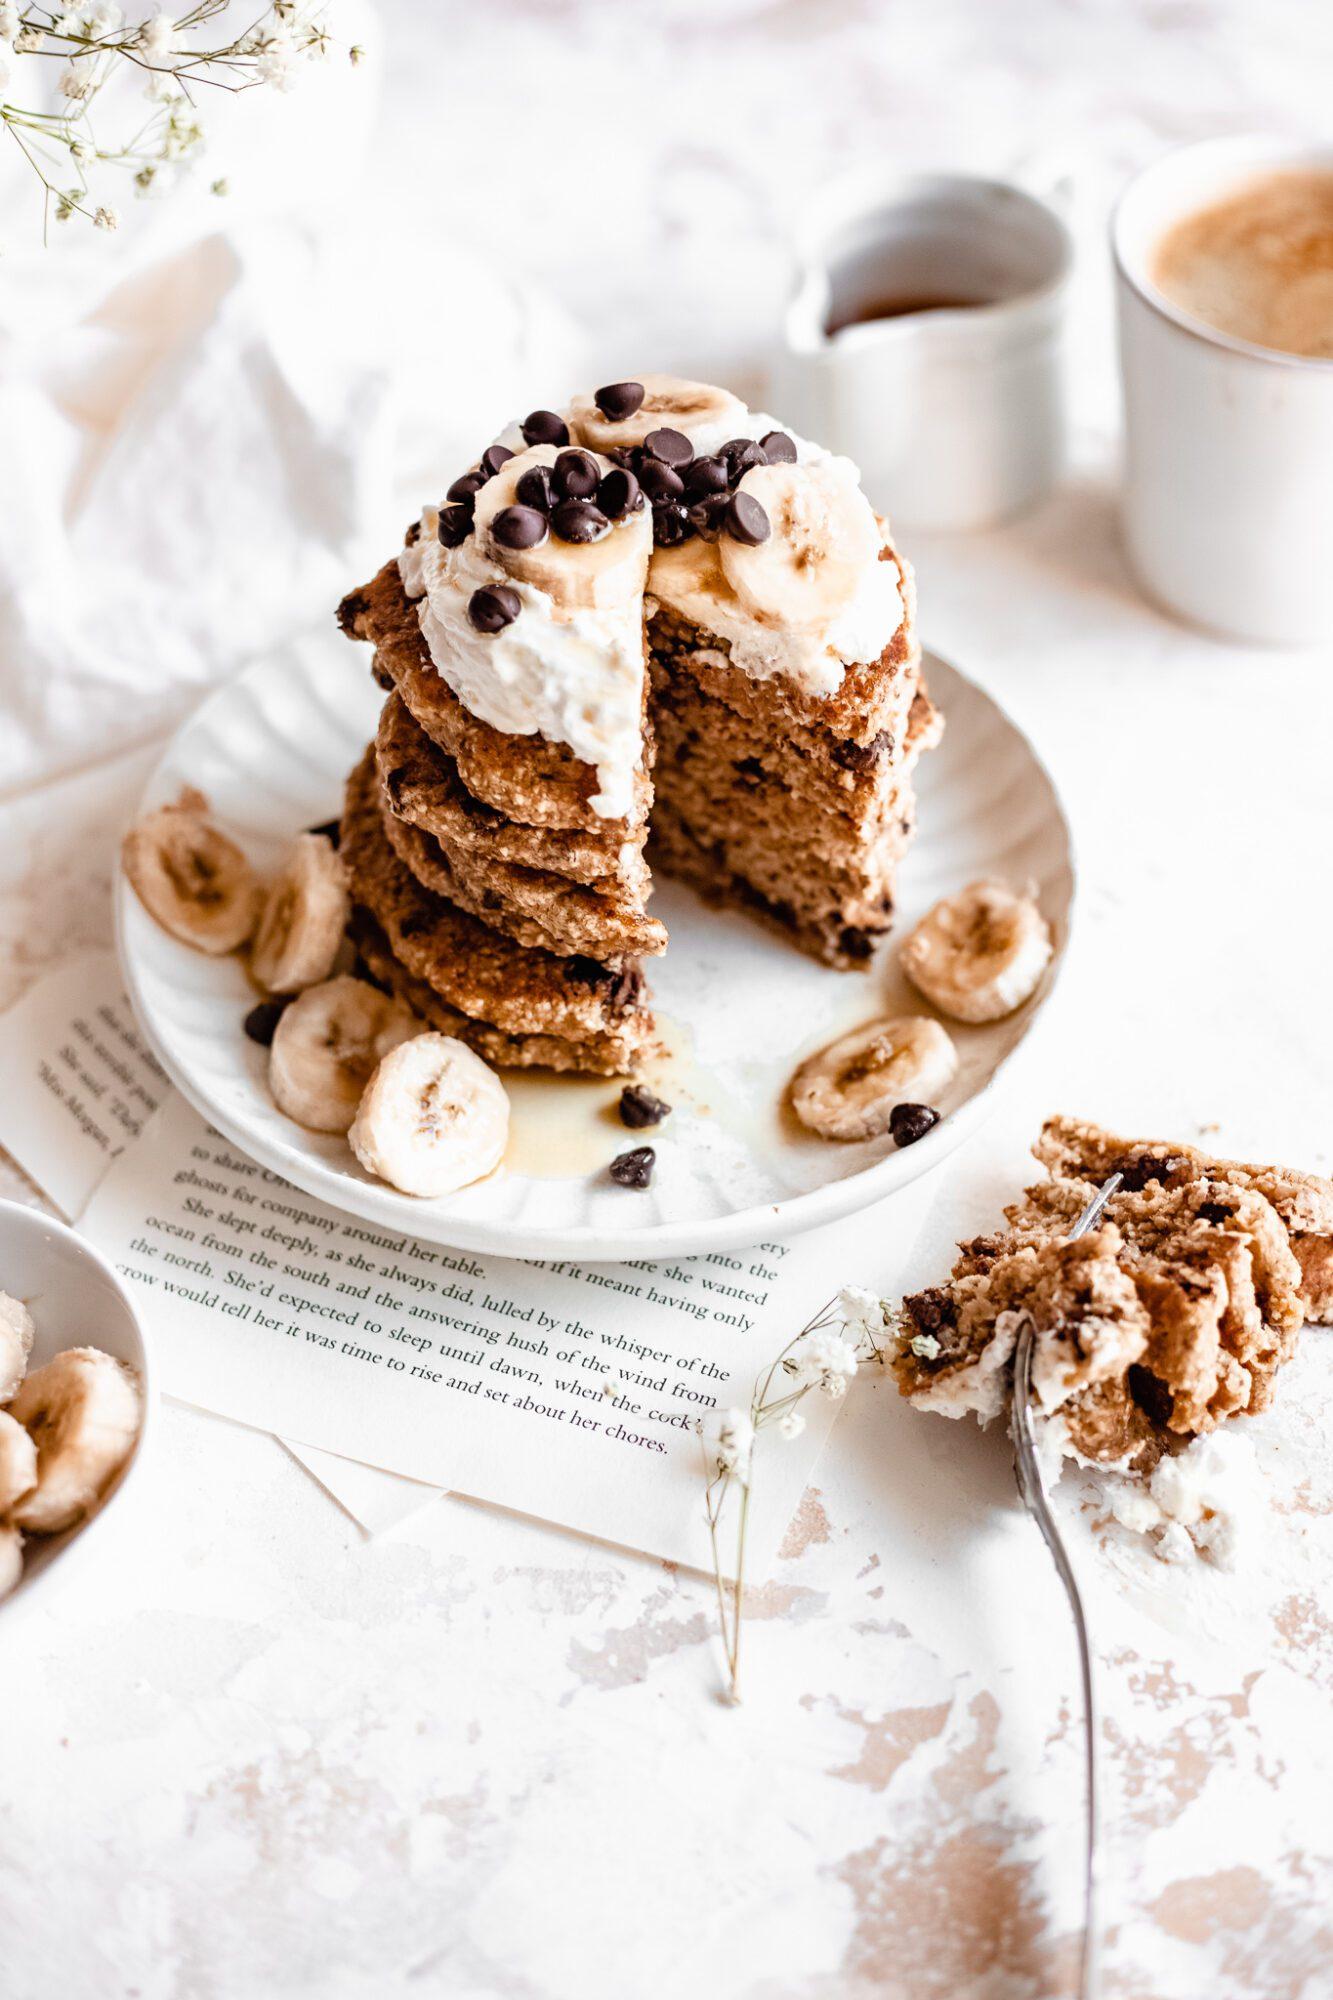 sliced healthy vegan pancakes with bananas on top